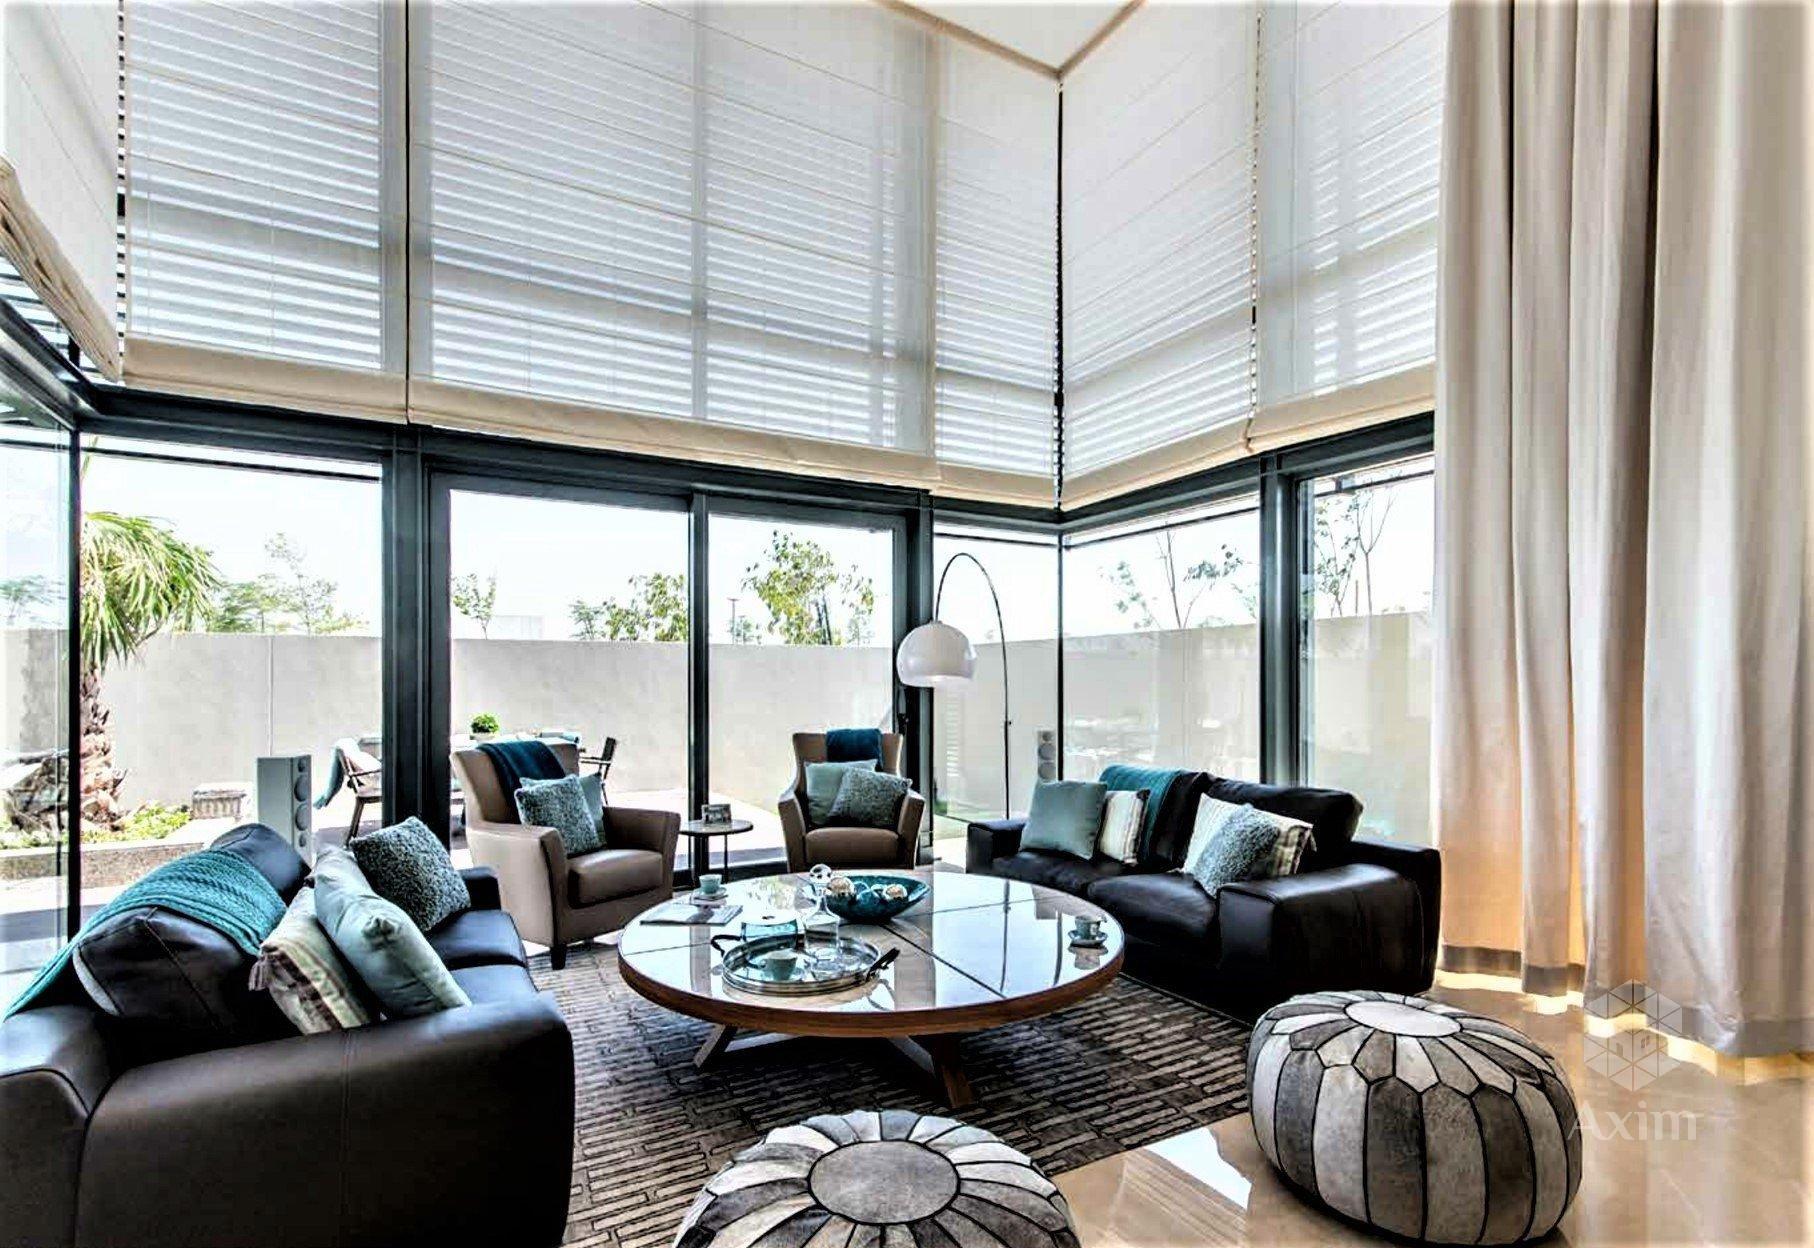 Vendita Villa - Dubai - Emirati Arabi Uniti